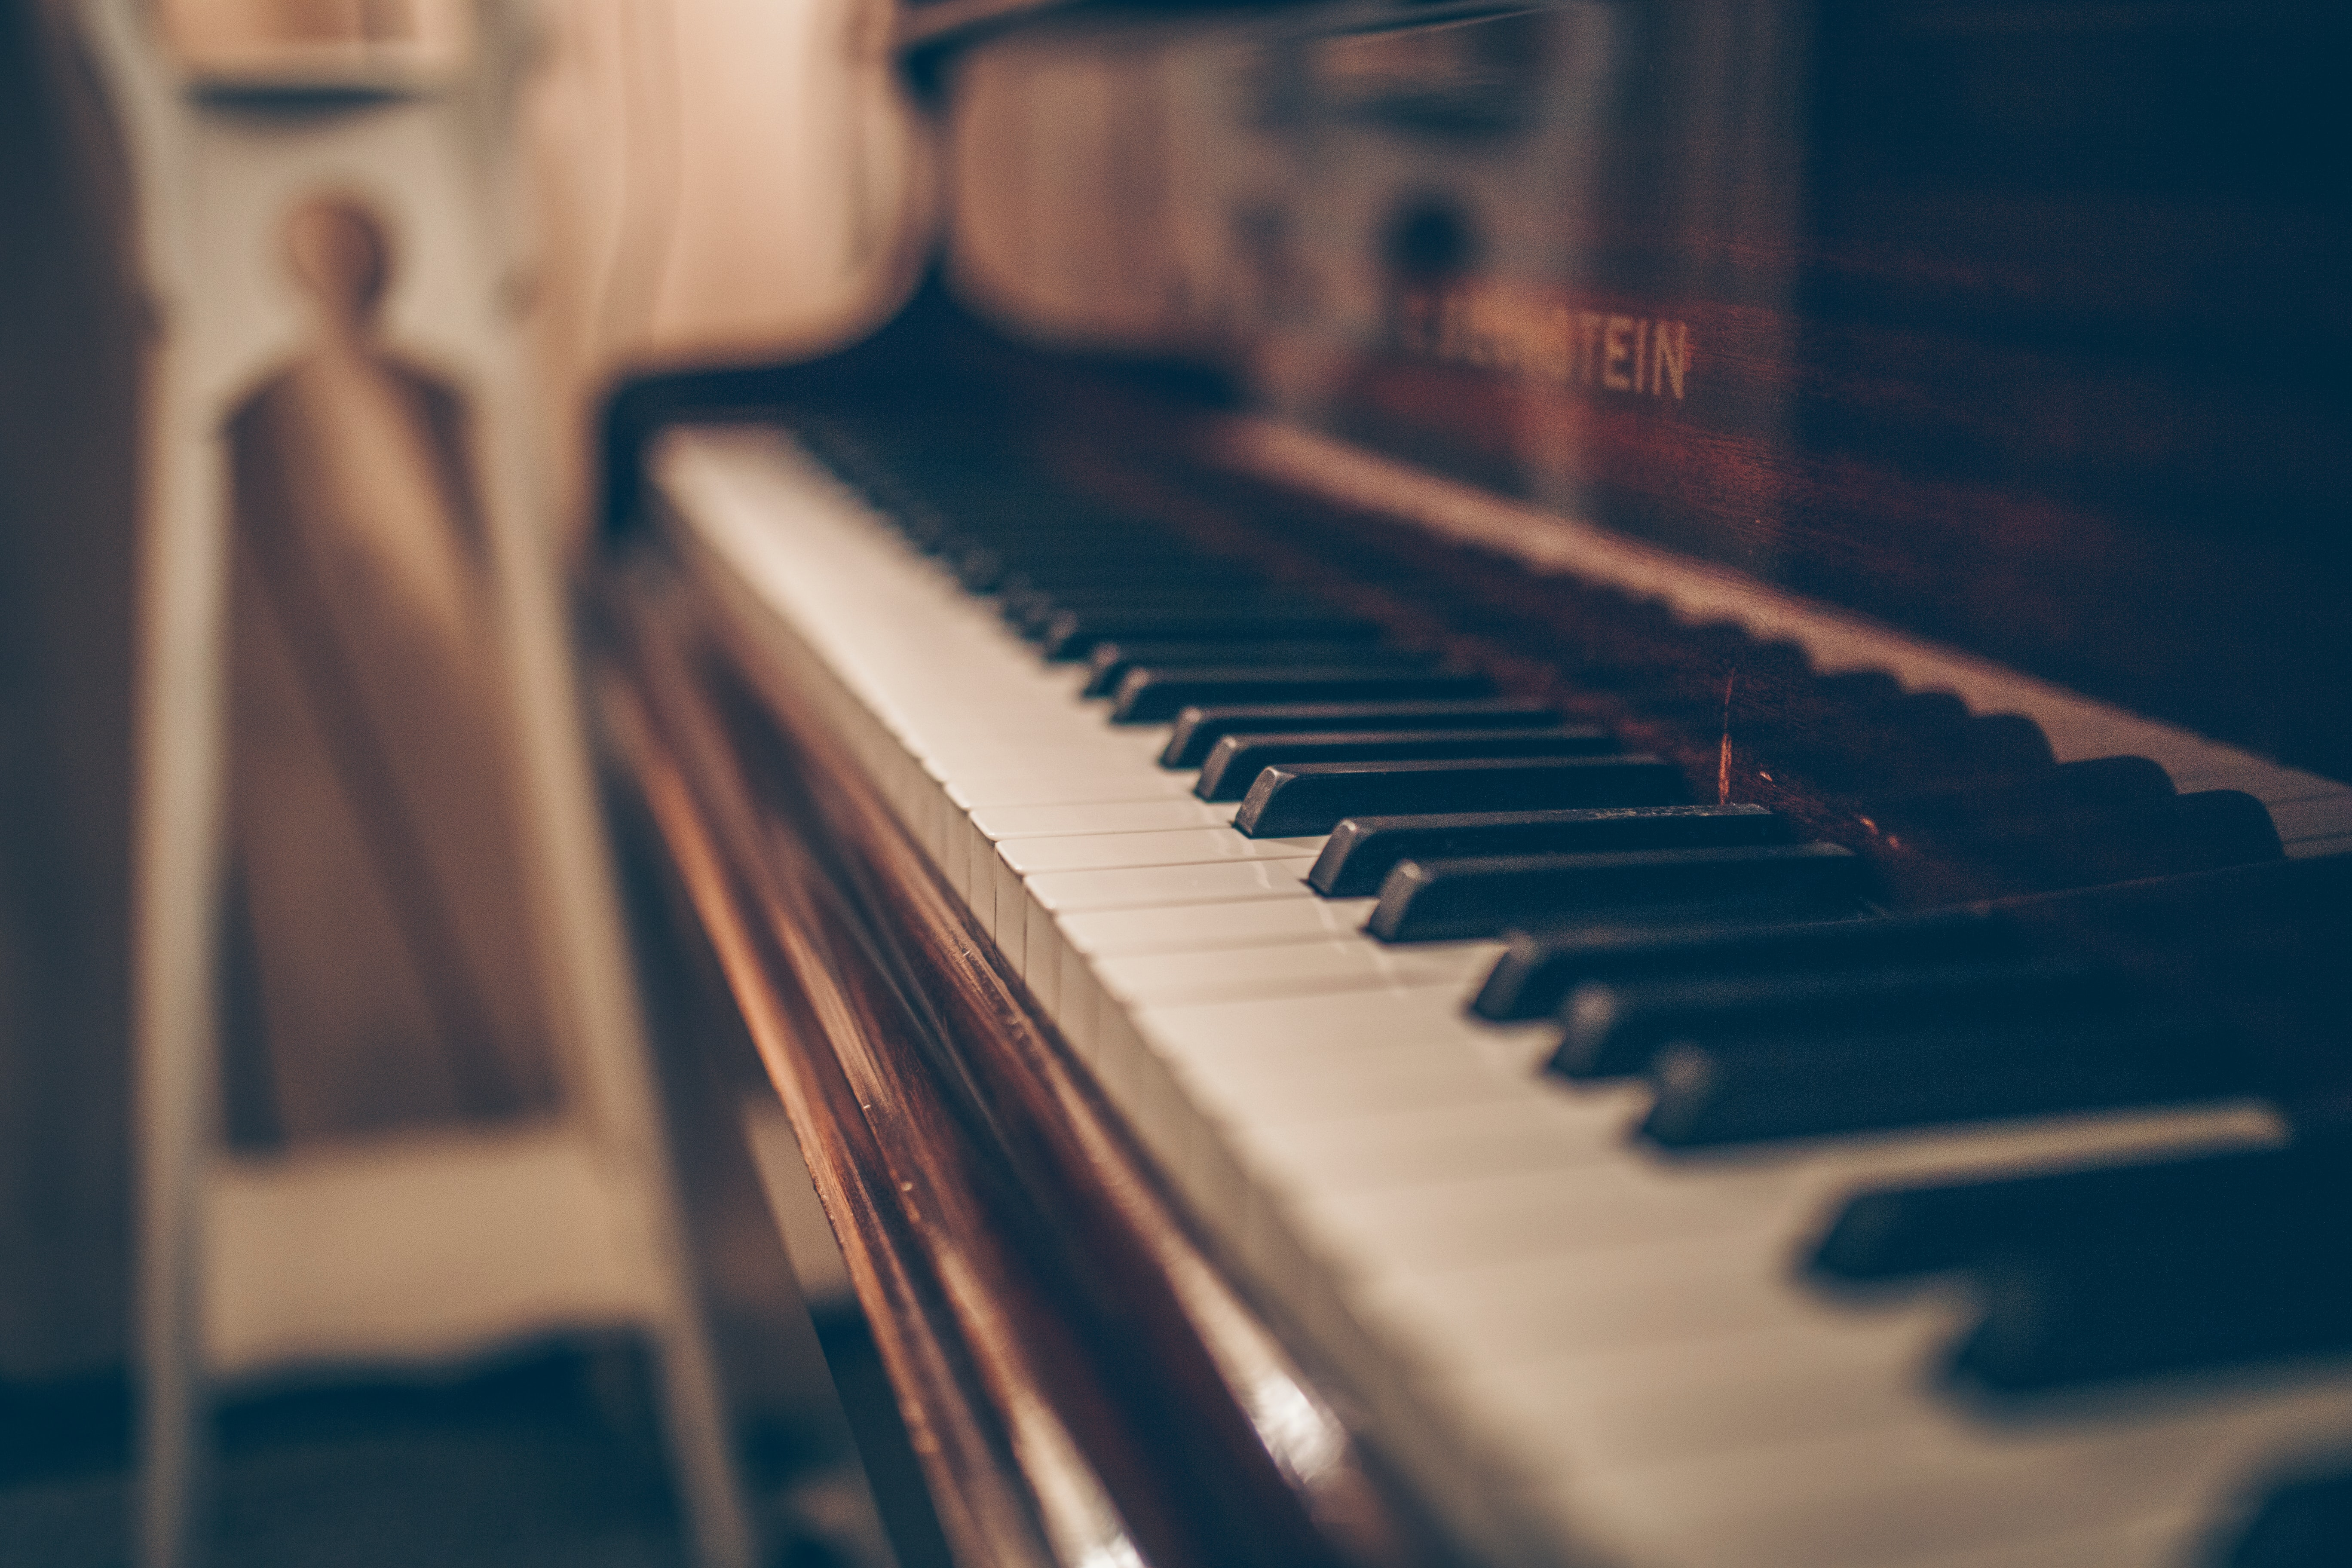 piano-keys-closeup